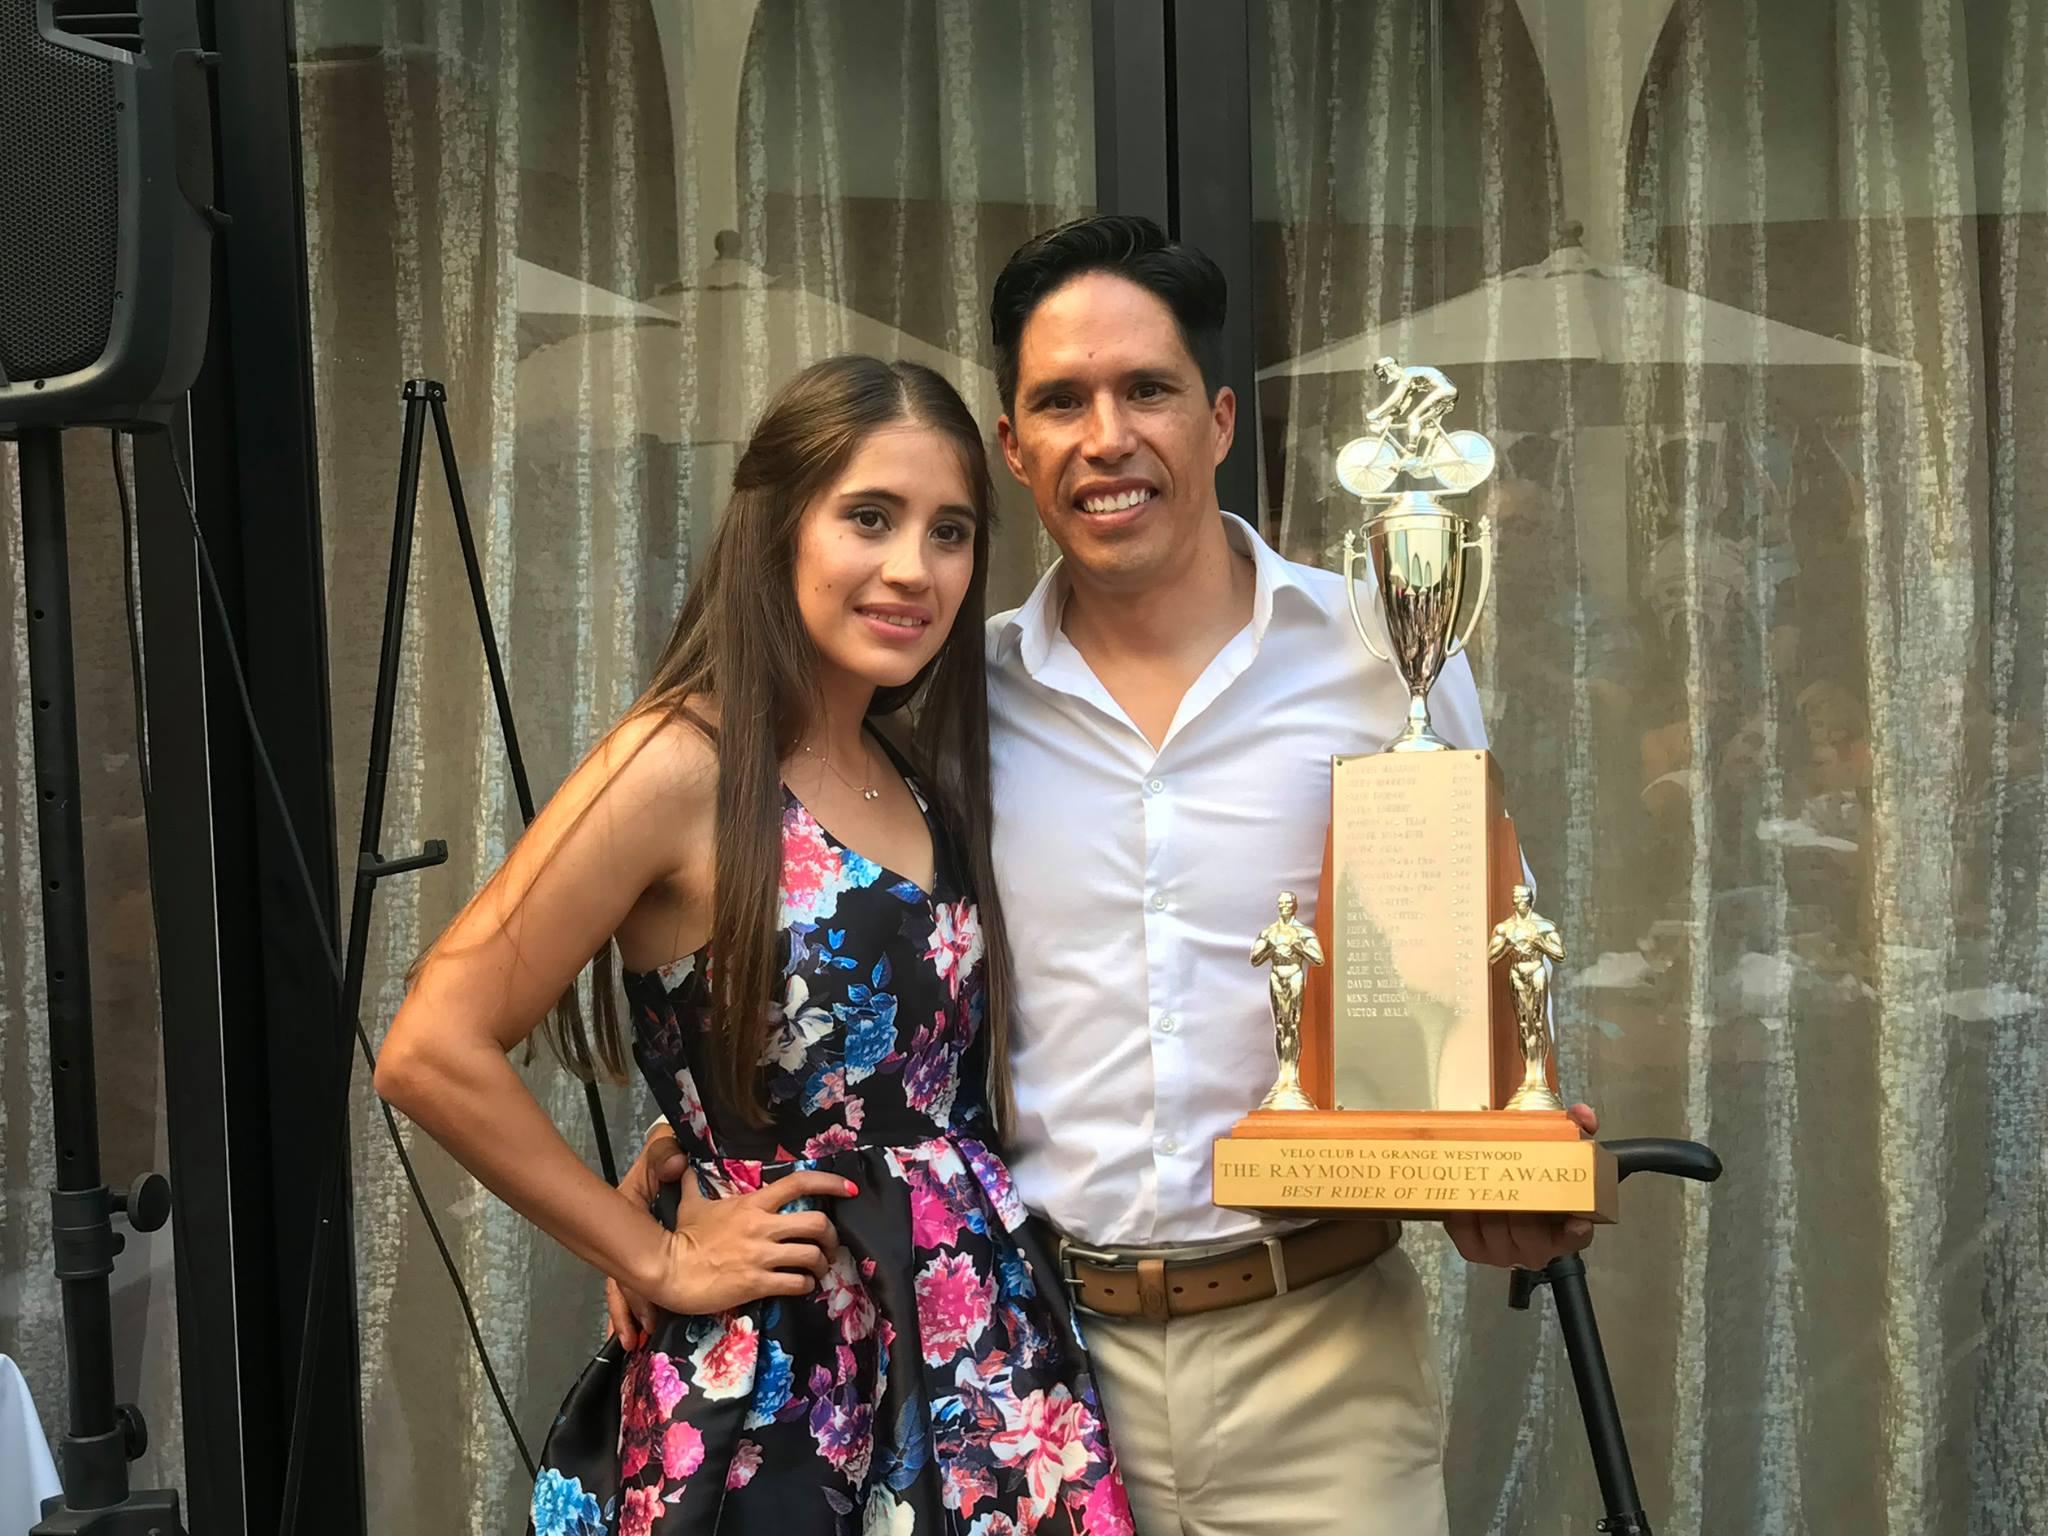 Stu Press Most Improved Racer award winner Lizbeth Urmas with Raymond Fouquet Trophy winner Victor Ayala.